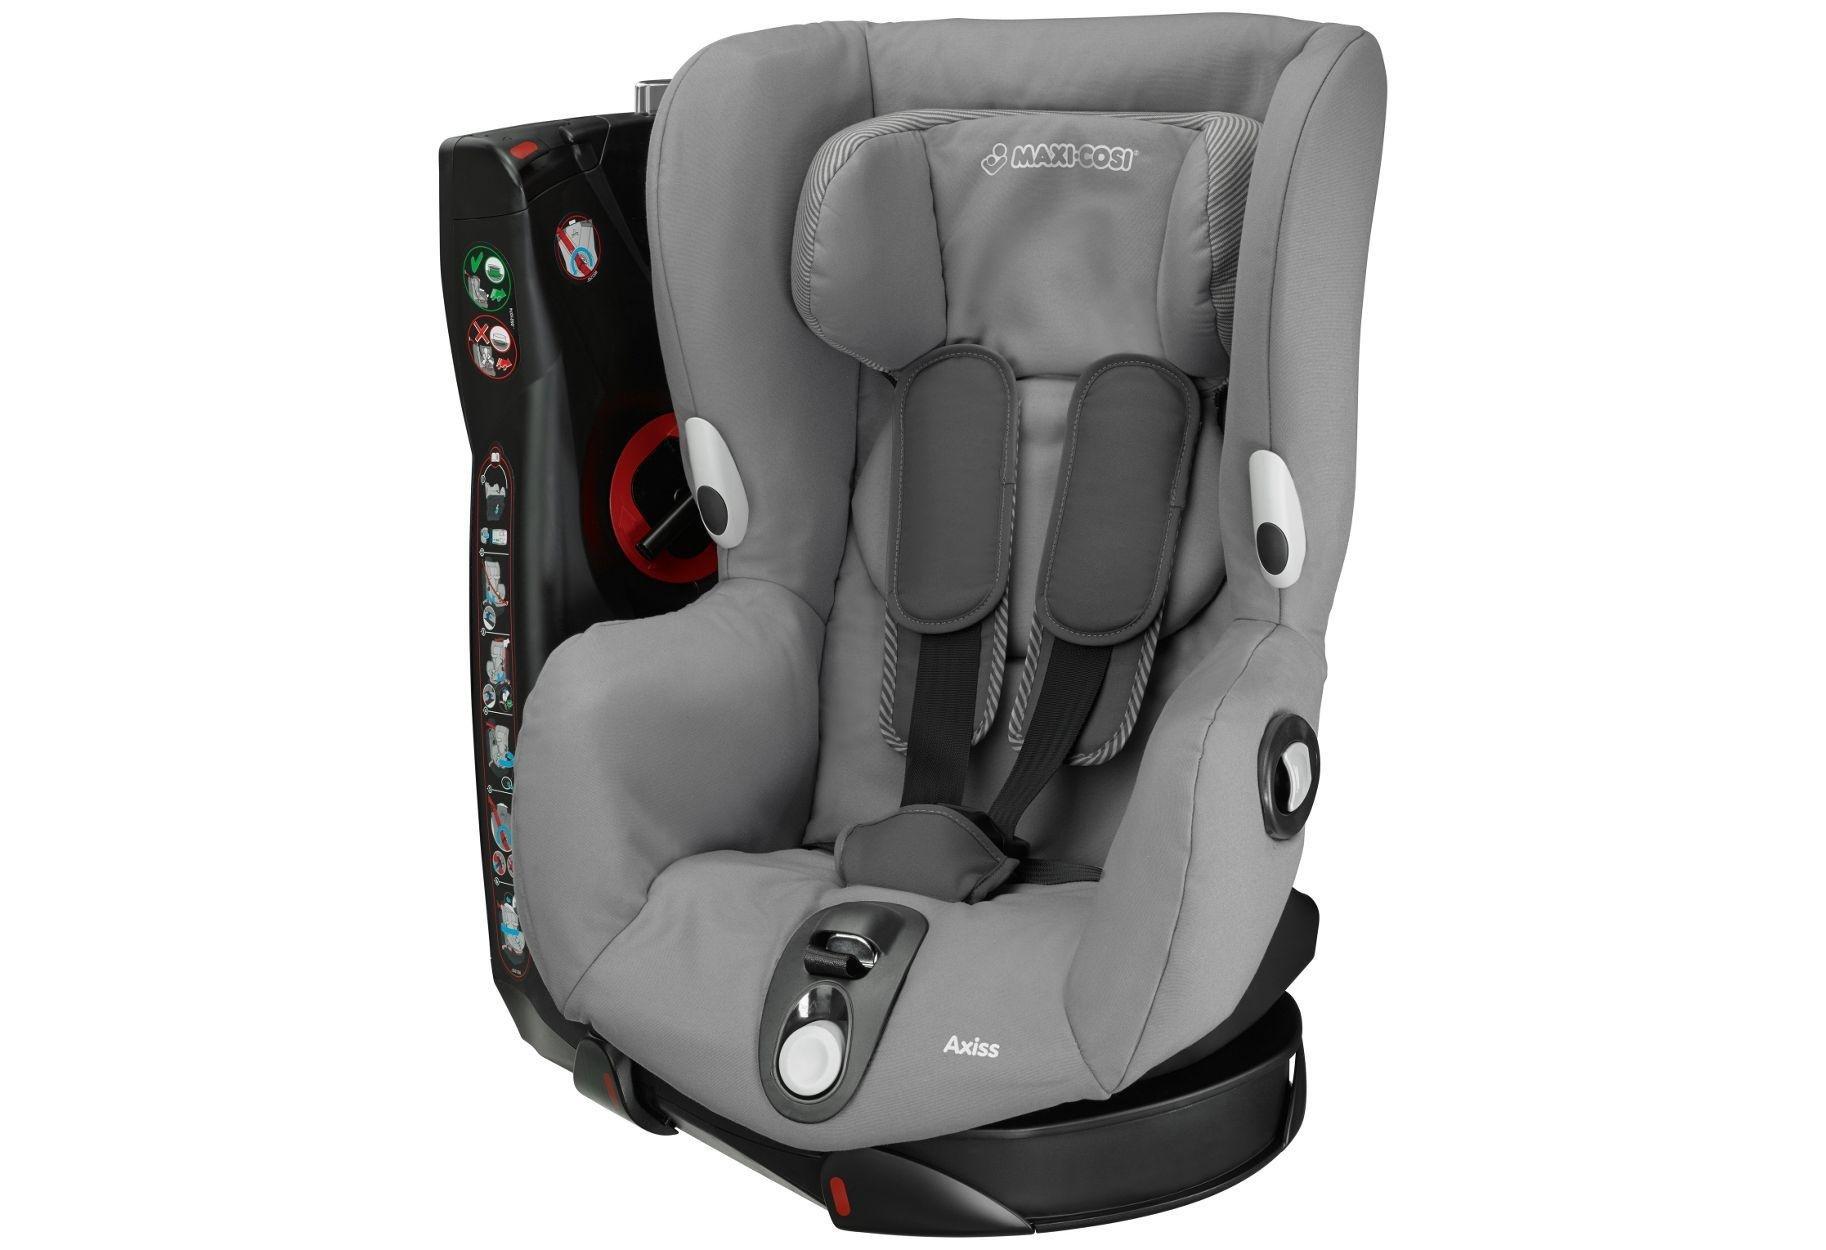 Maxi-Cosi Axiss Group 1 Car Seat - Concrete Grey